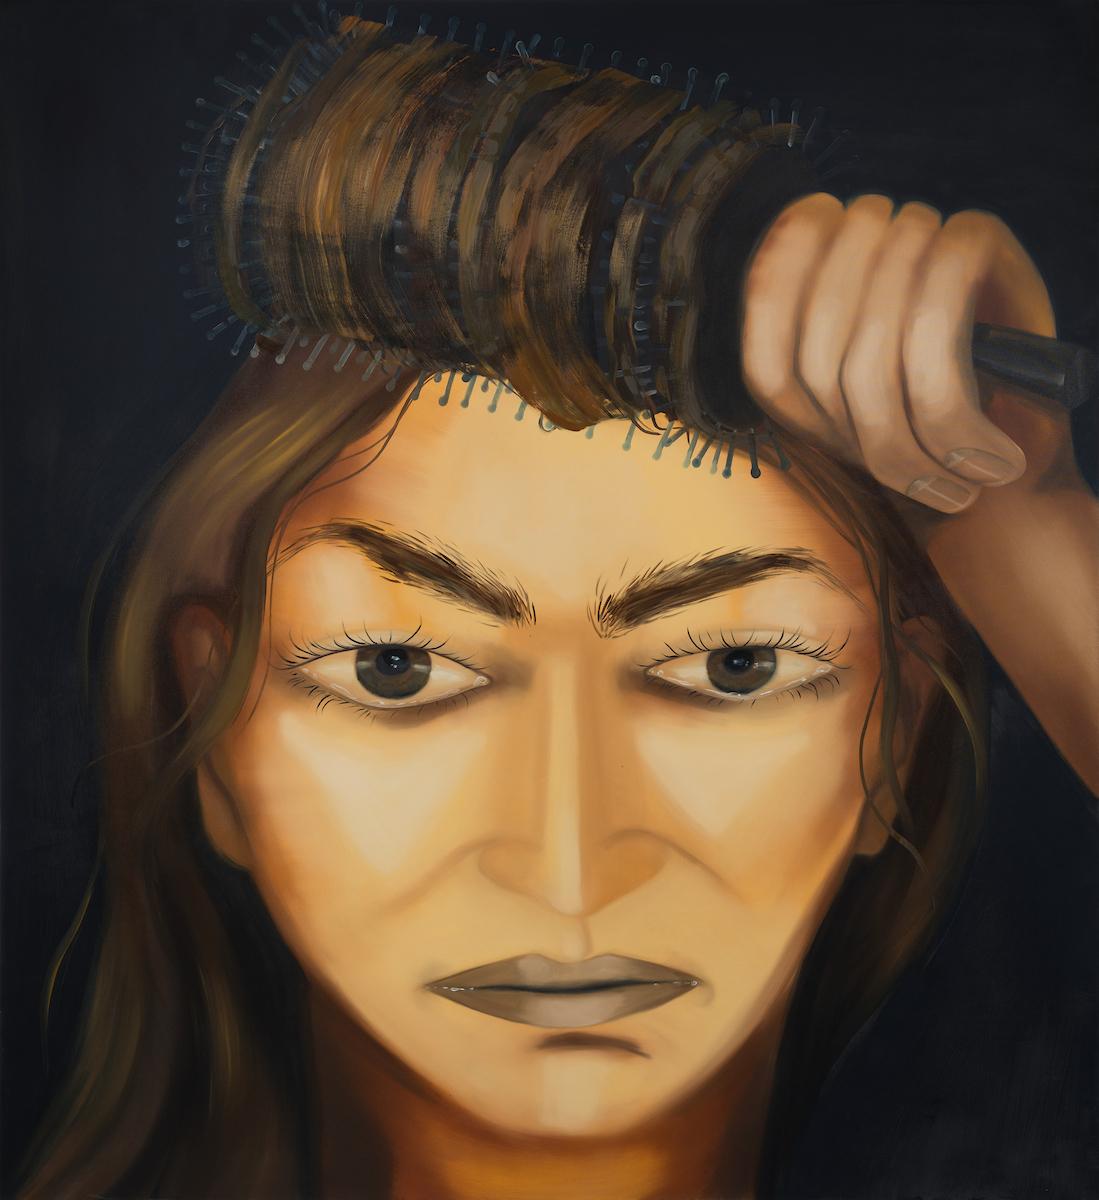 Karolina Jabłońska. <em>combing hair II</em>, 2021. Oil on canvas, 72 7/8 x 63 inches (185.1 x 160 cm)